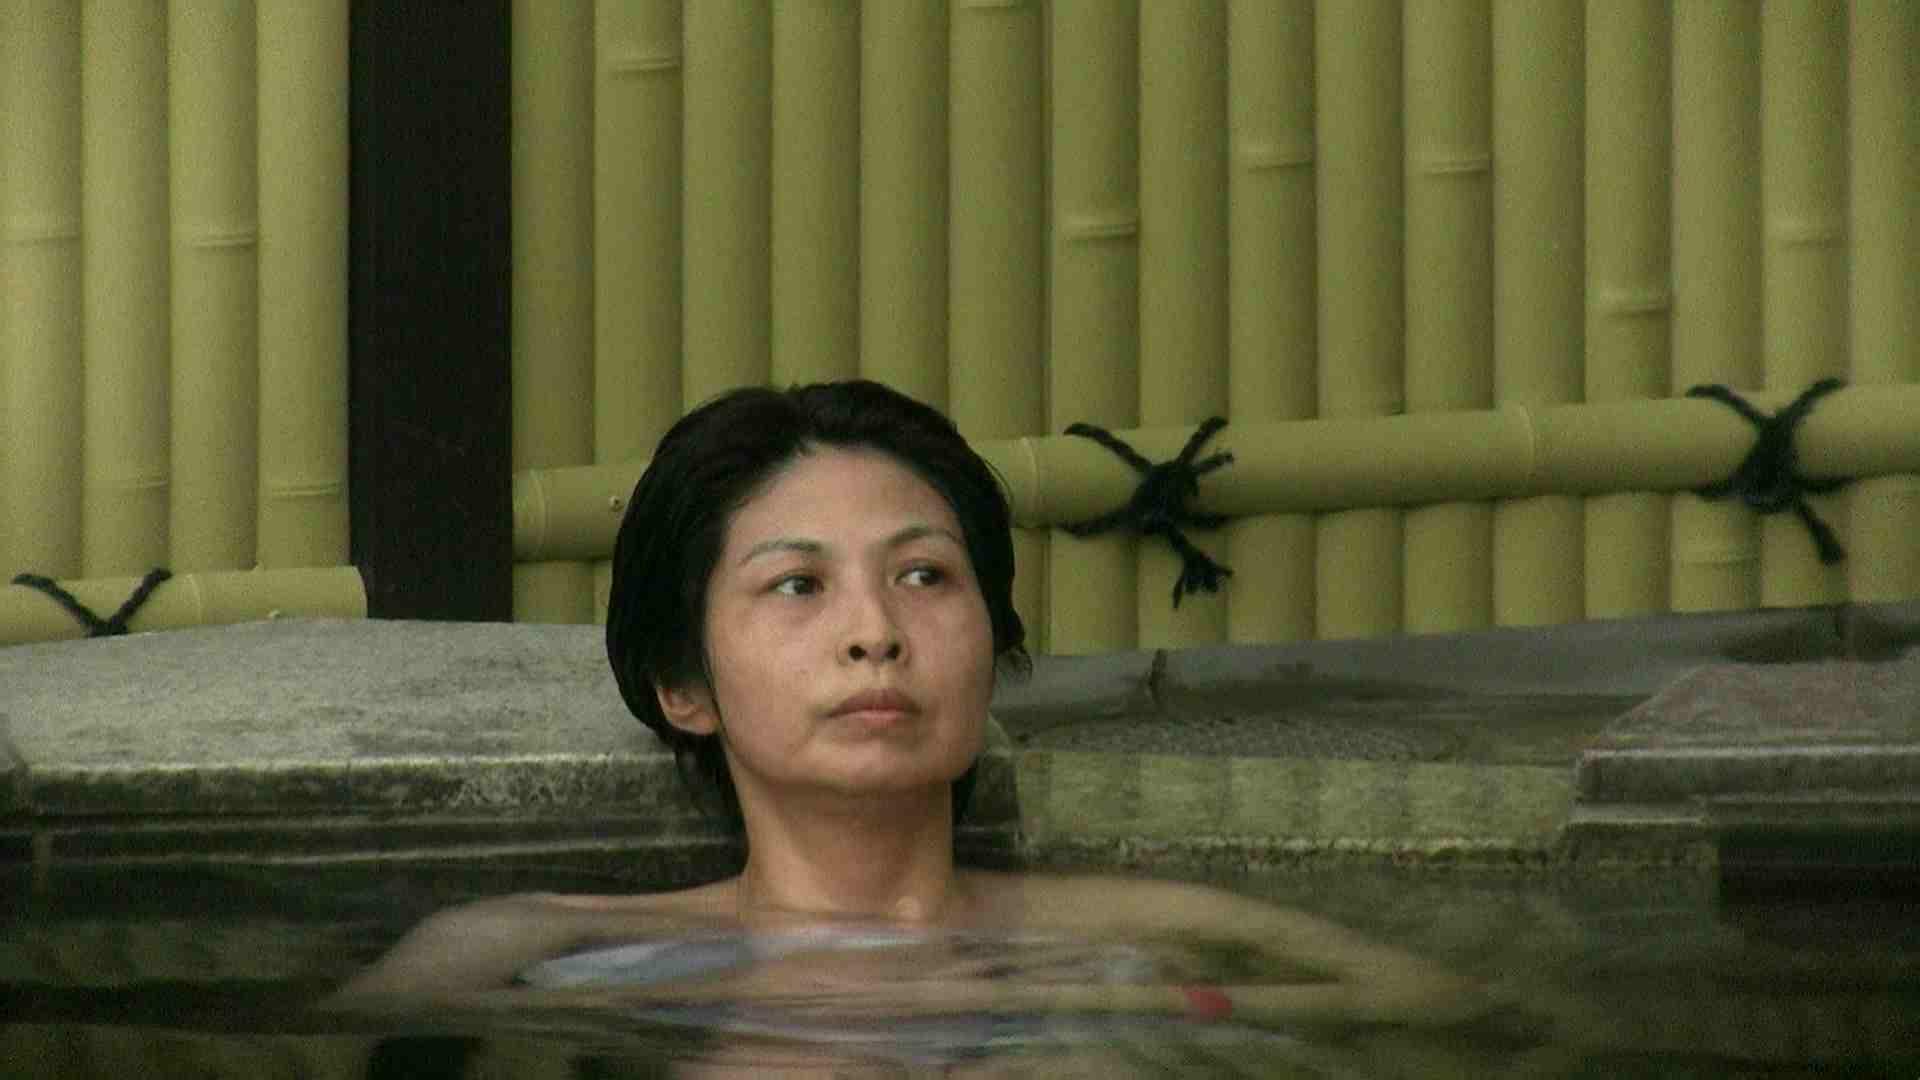 Aquaな露天風呂Vol.636 0 | 0  45連発 13